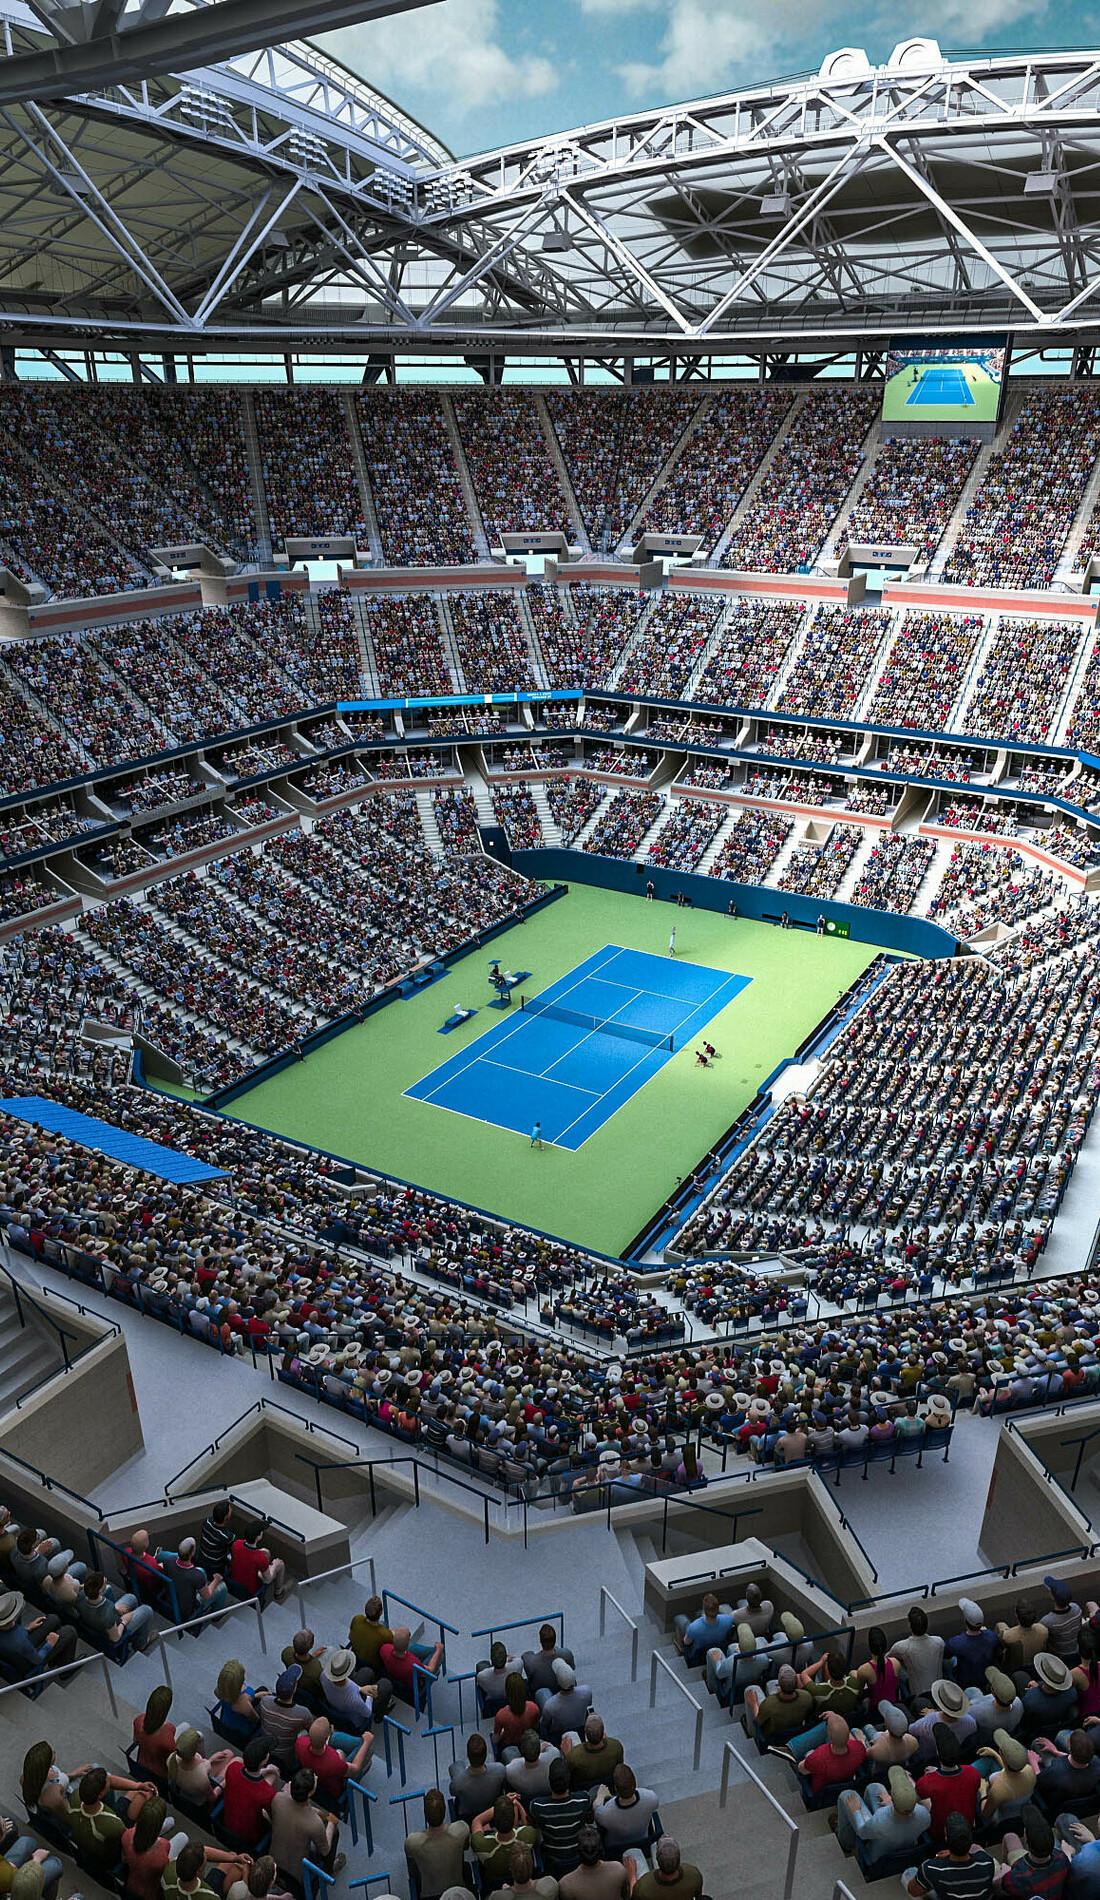 A US Open Tennis live event